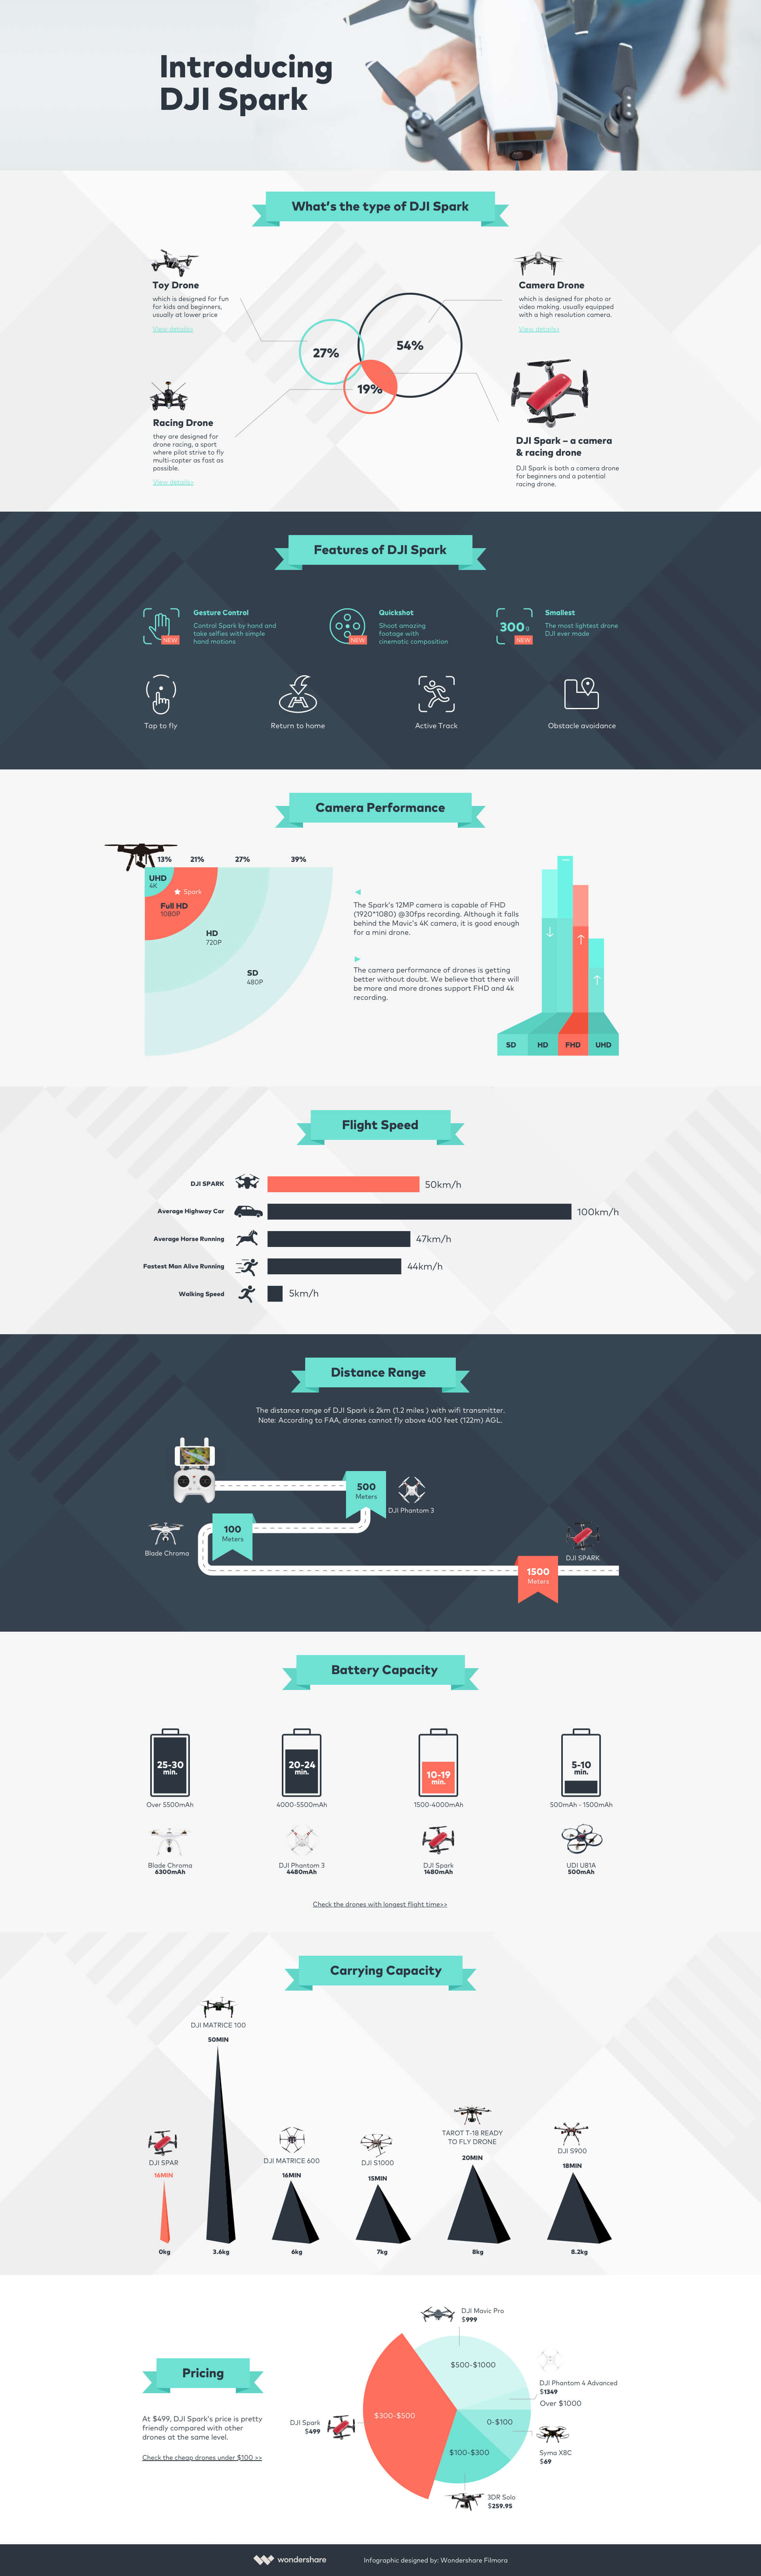 dji-spark-infographic-impressed